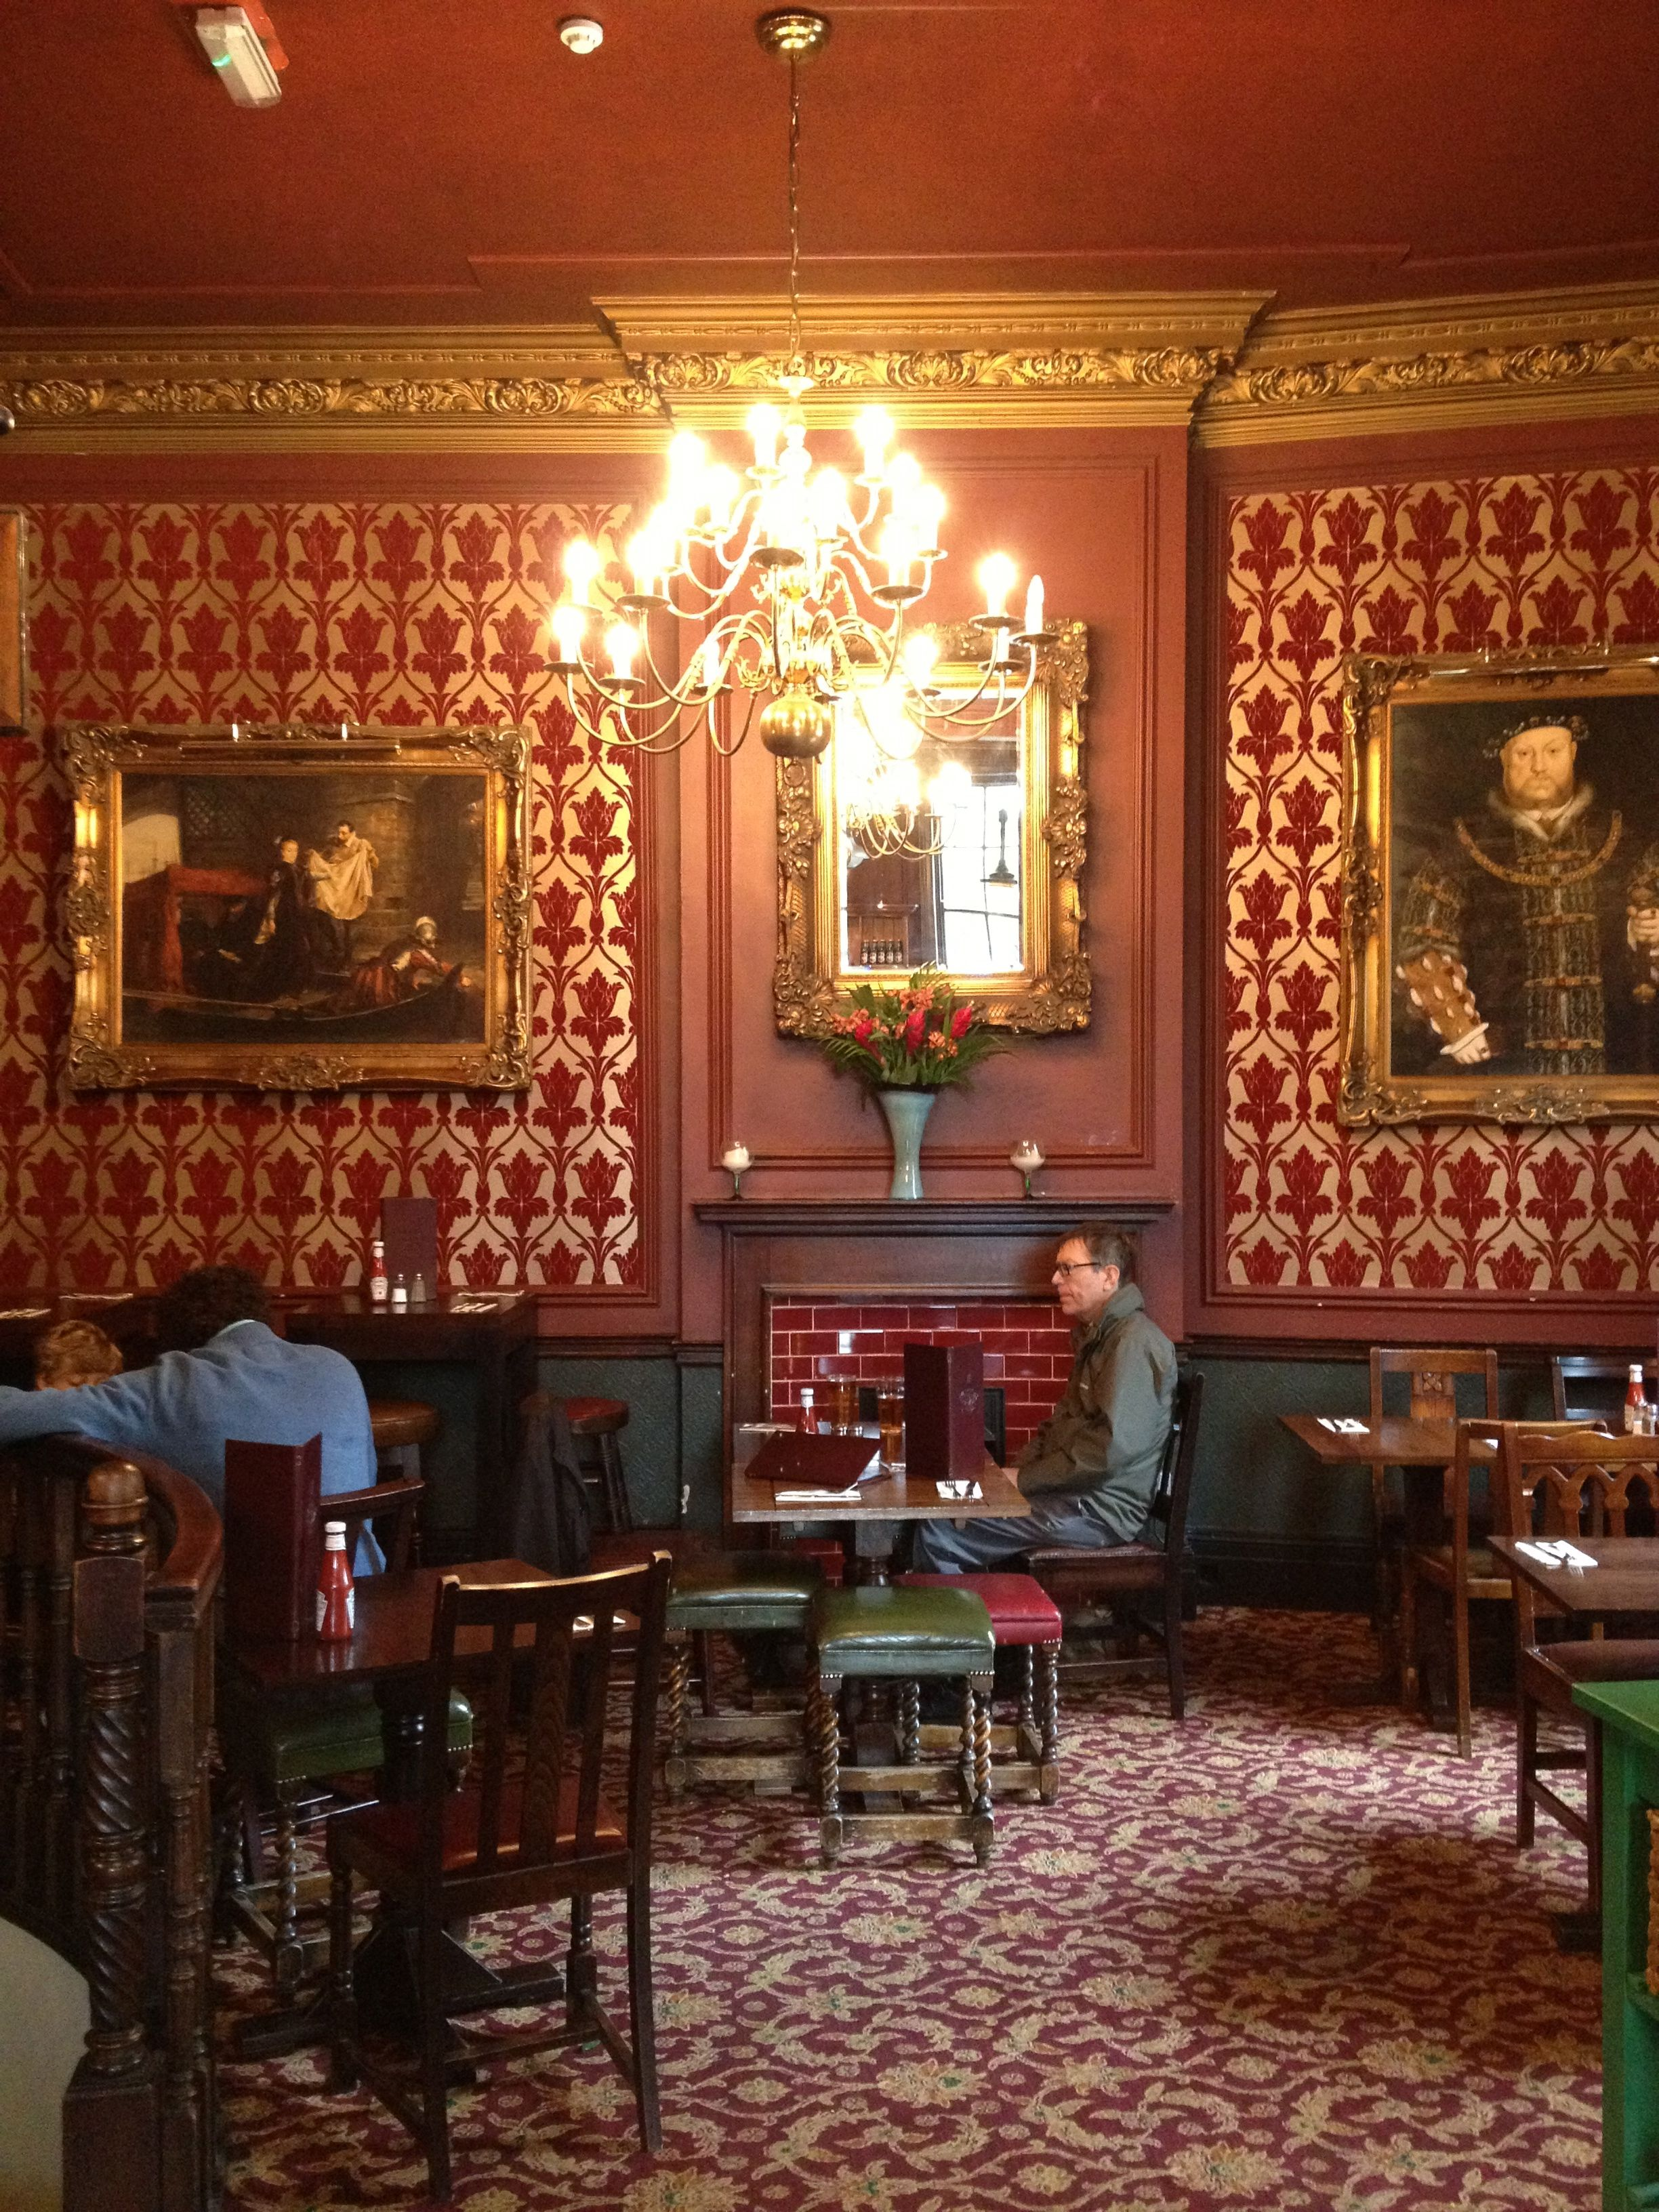 Pub decor London | Pub decor, Pub interior, Home pub